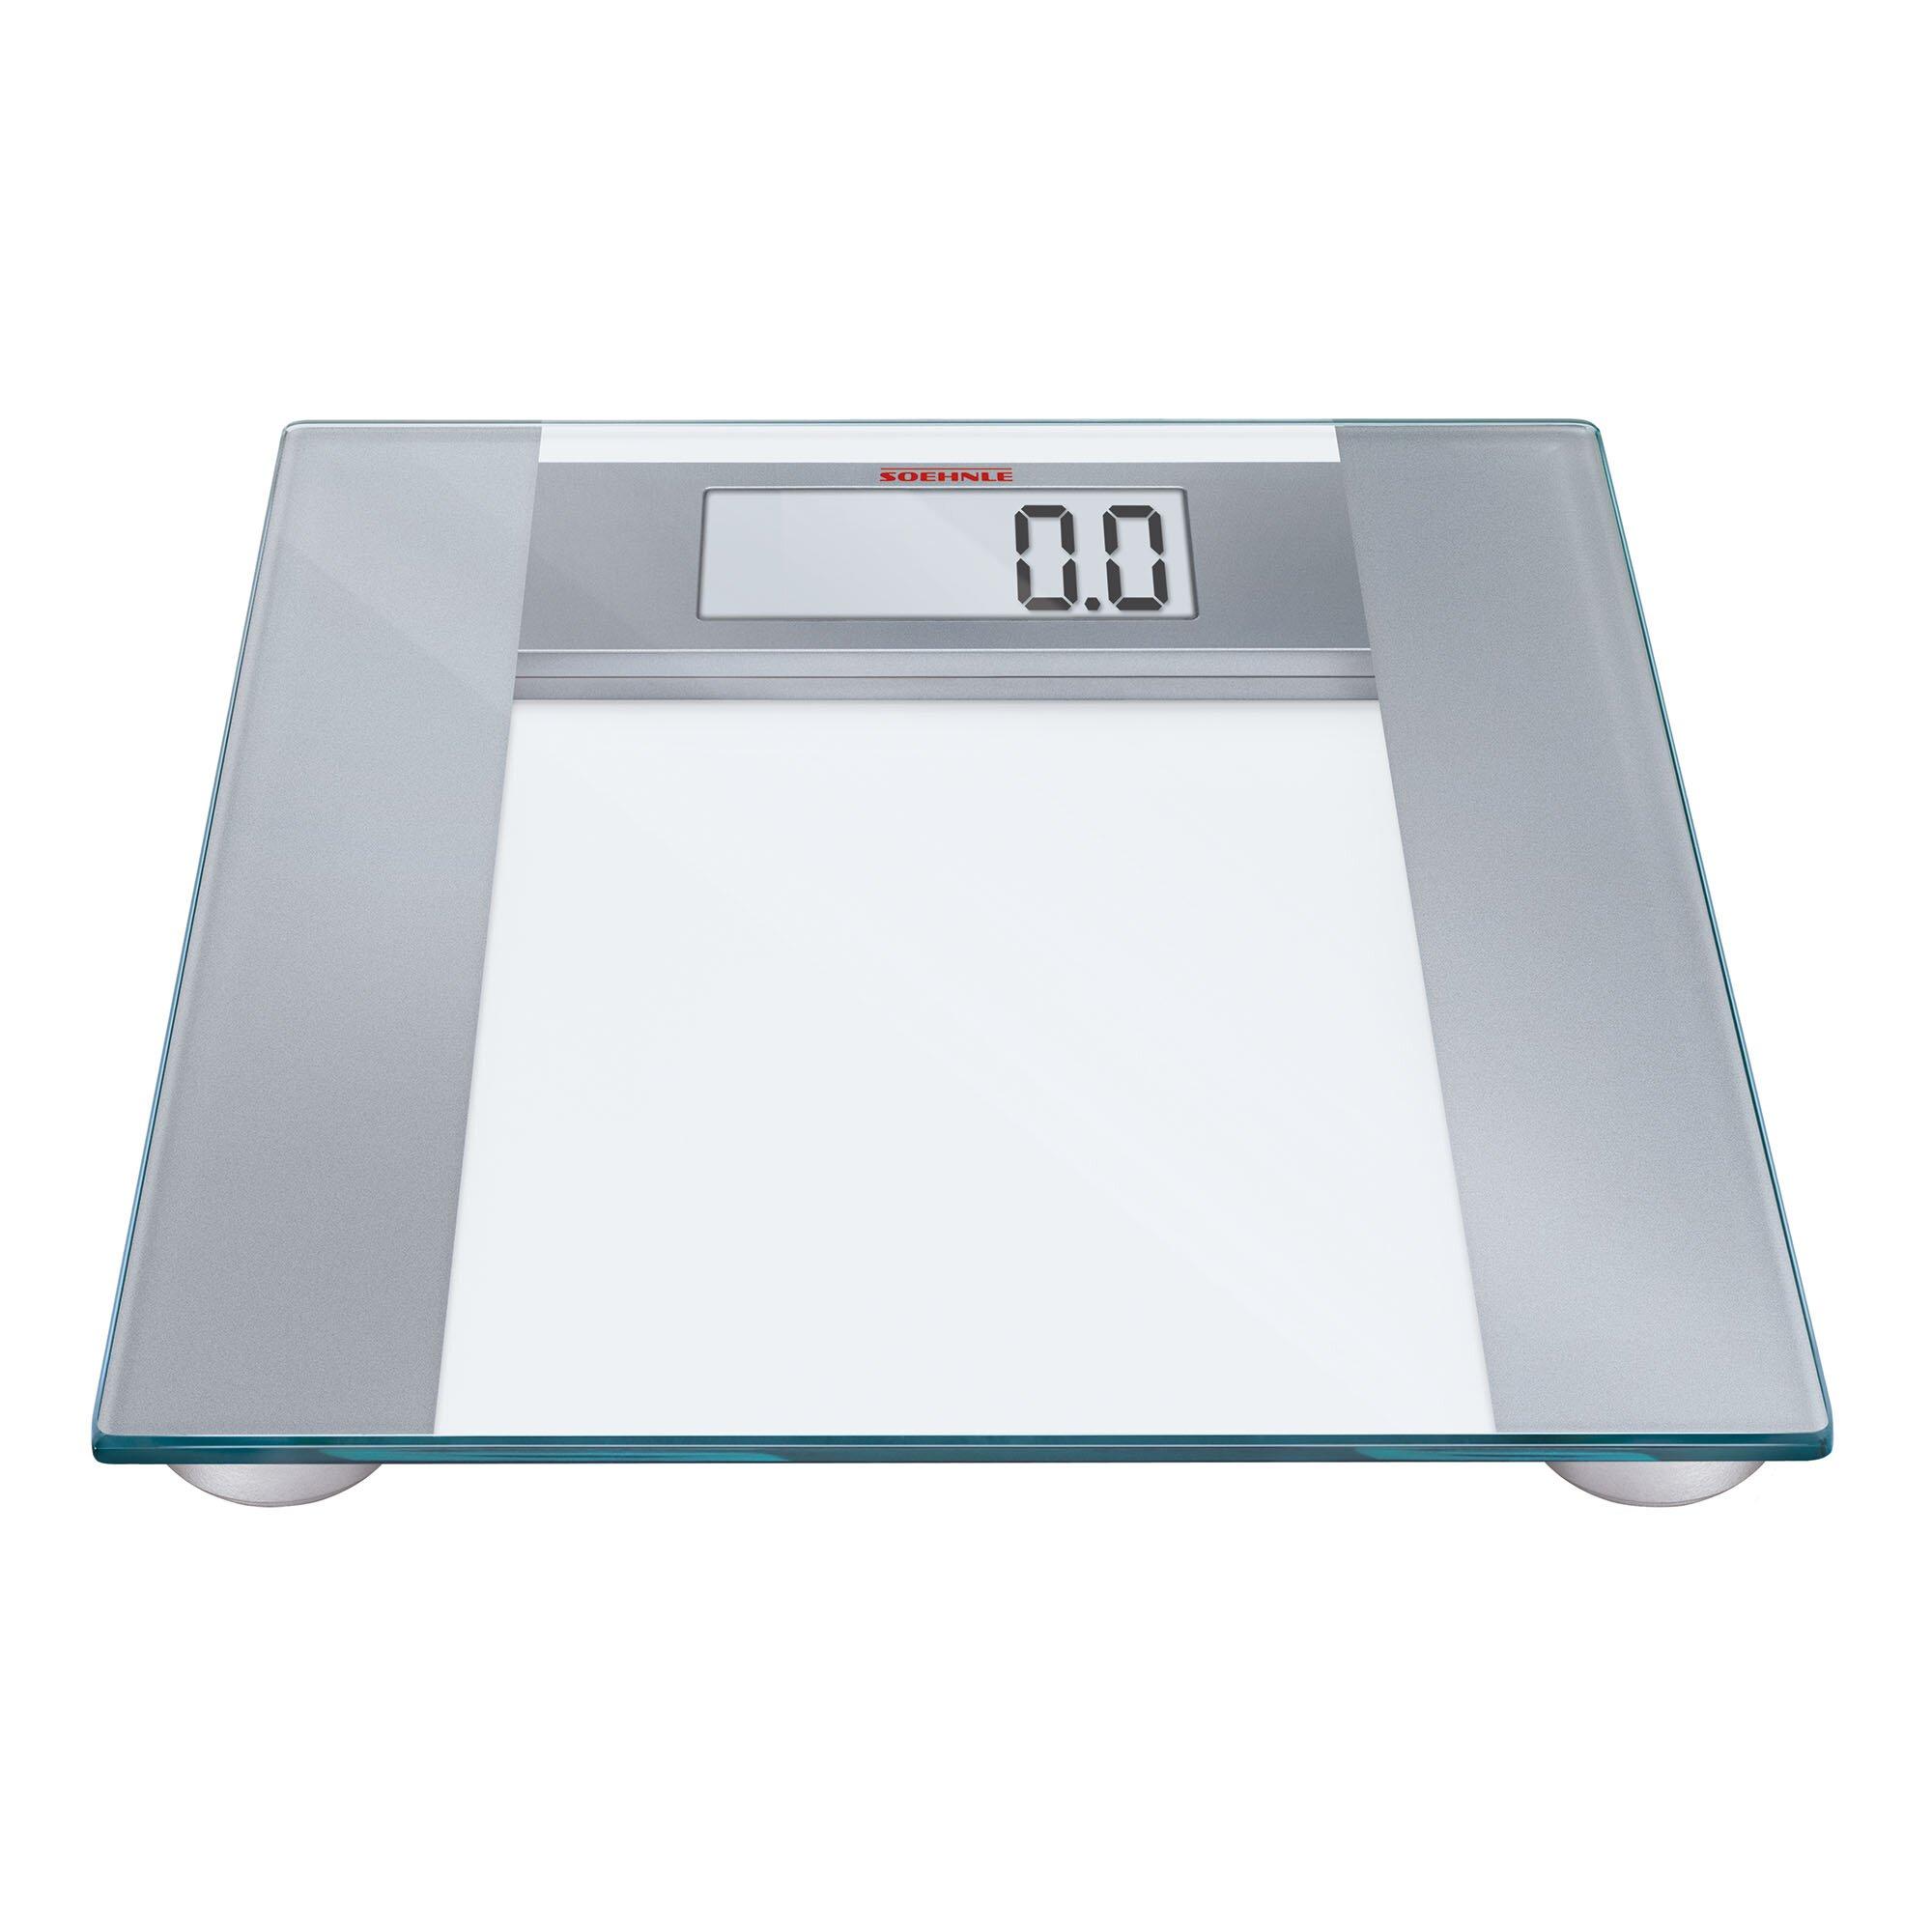 Briscoes weightwatchers bathroom scale body analysis 303a - Best Digital Bathroom Scales Reviews Bathroom Most Accurate Digital Bathroom Scale